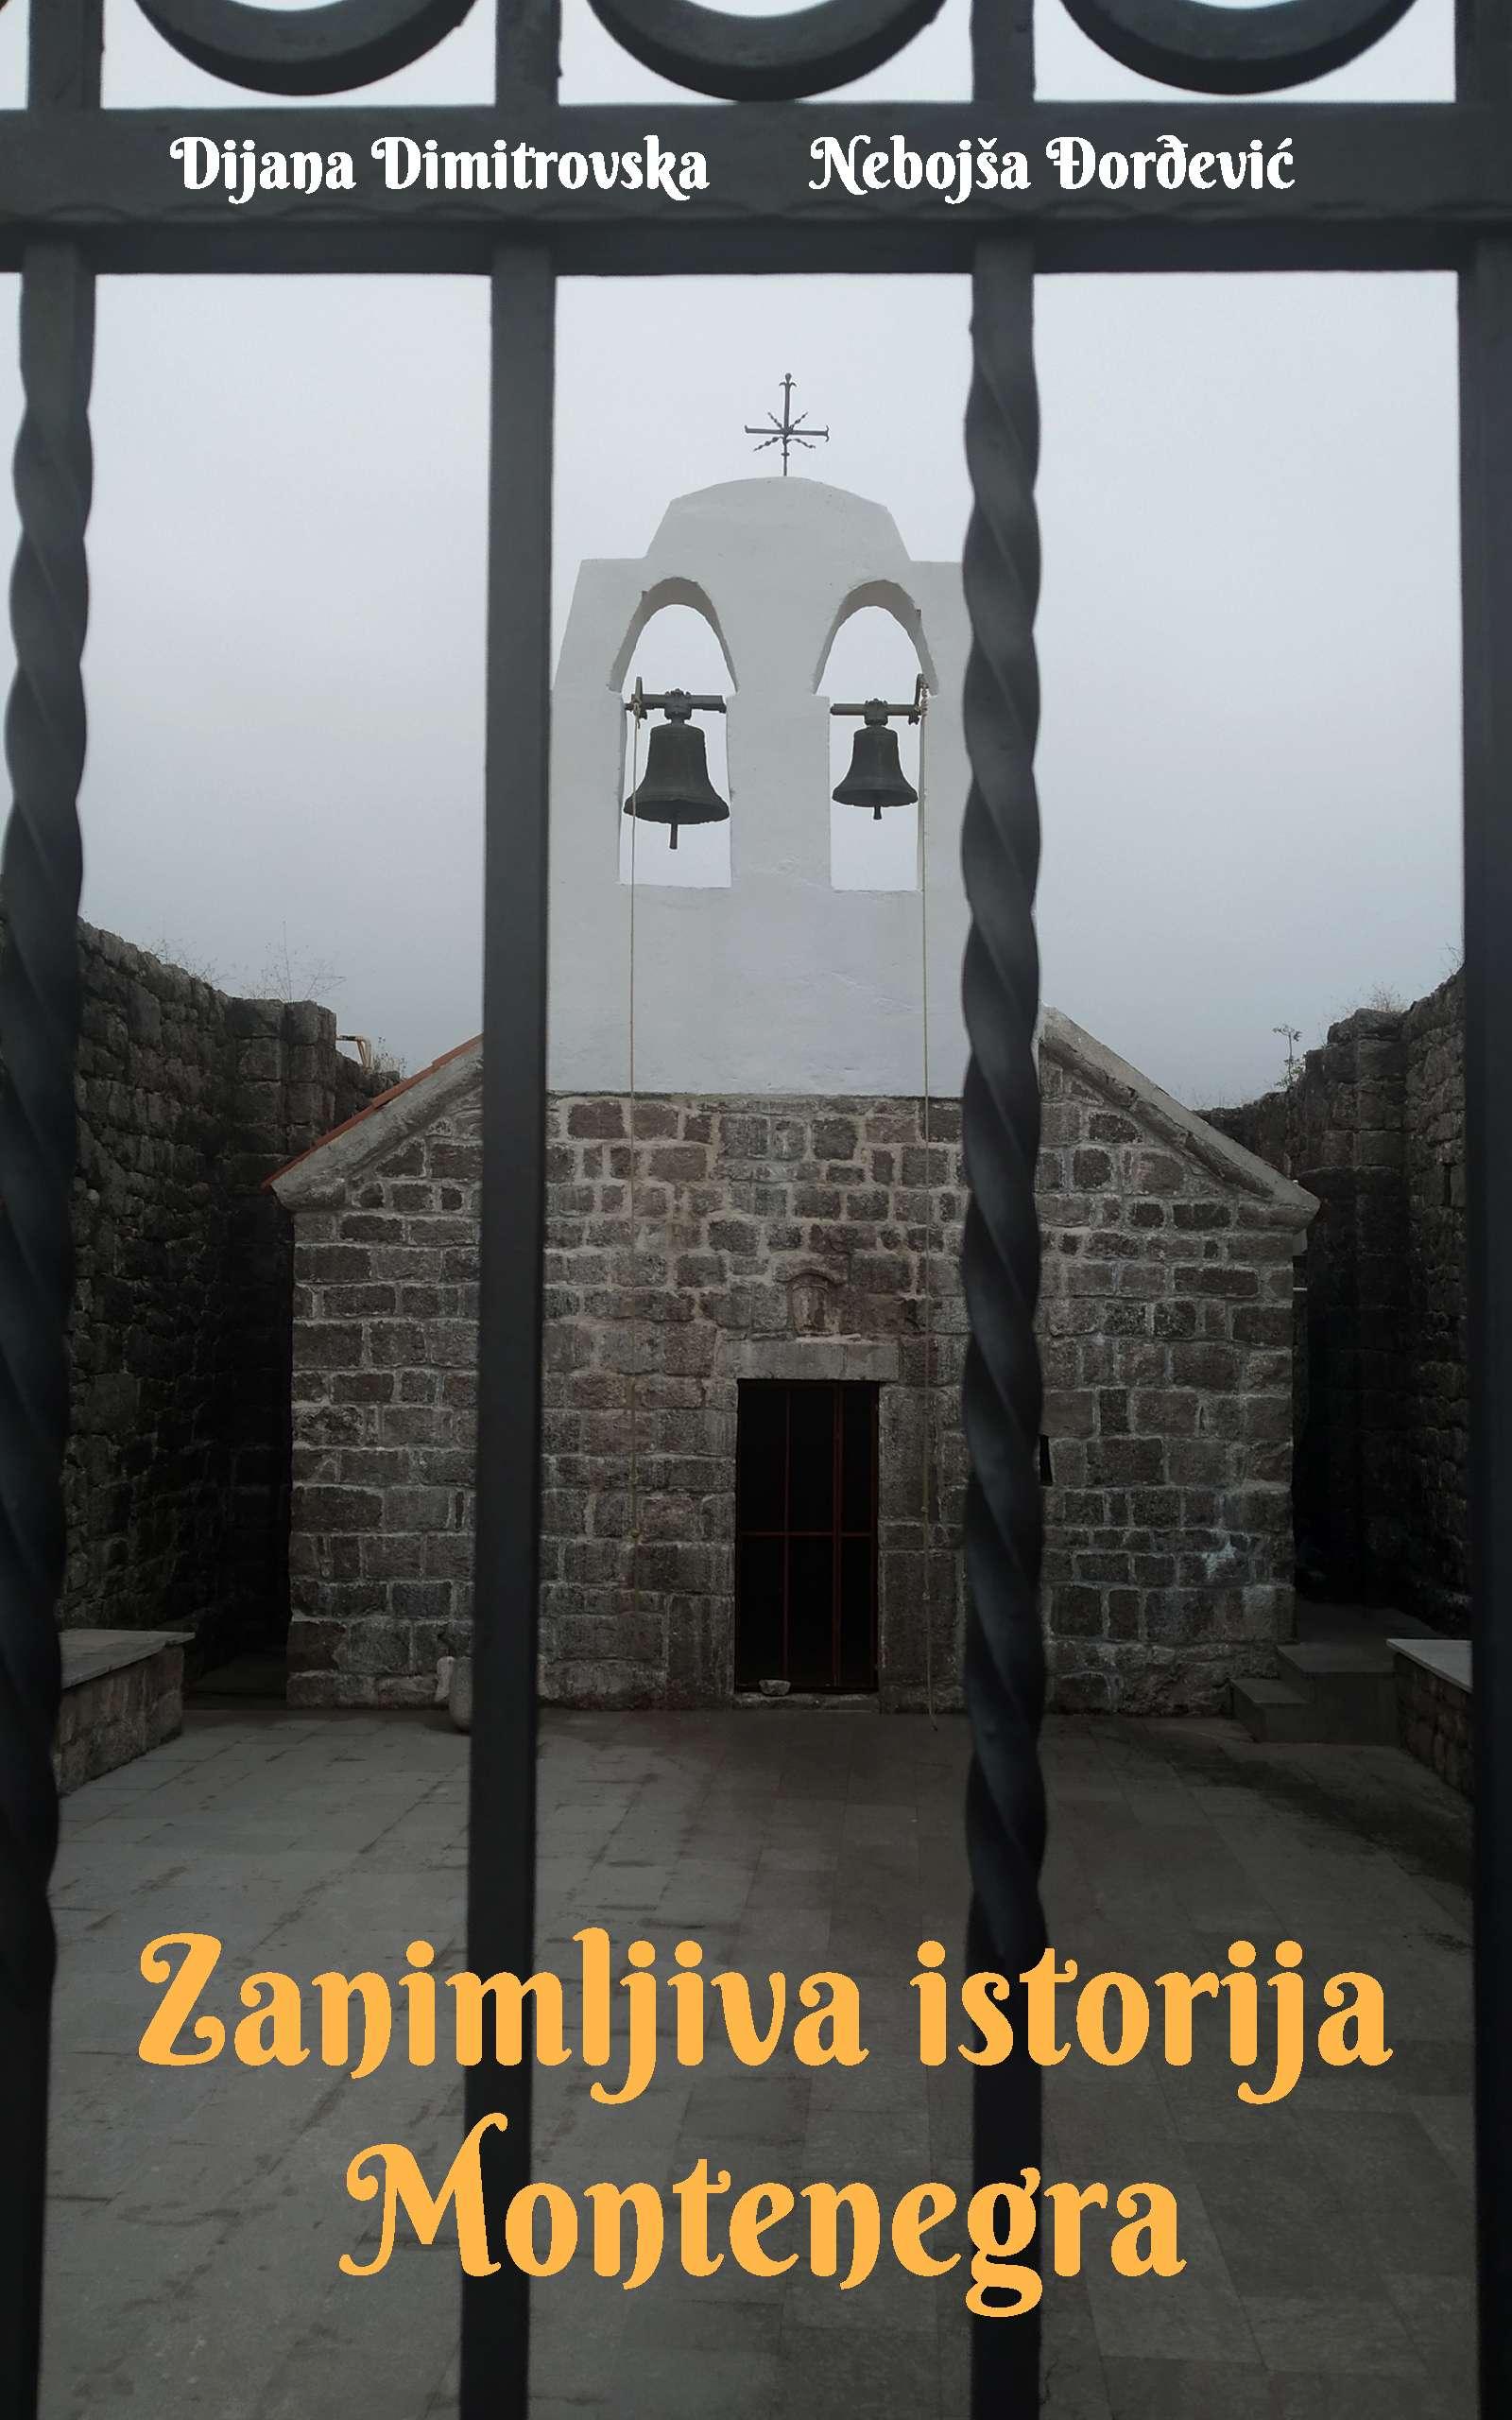 zanimljiva istorija montenegro